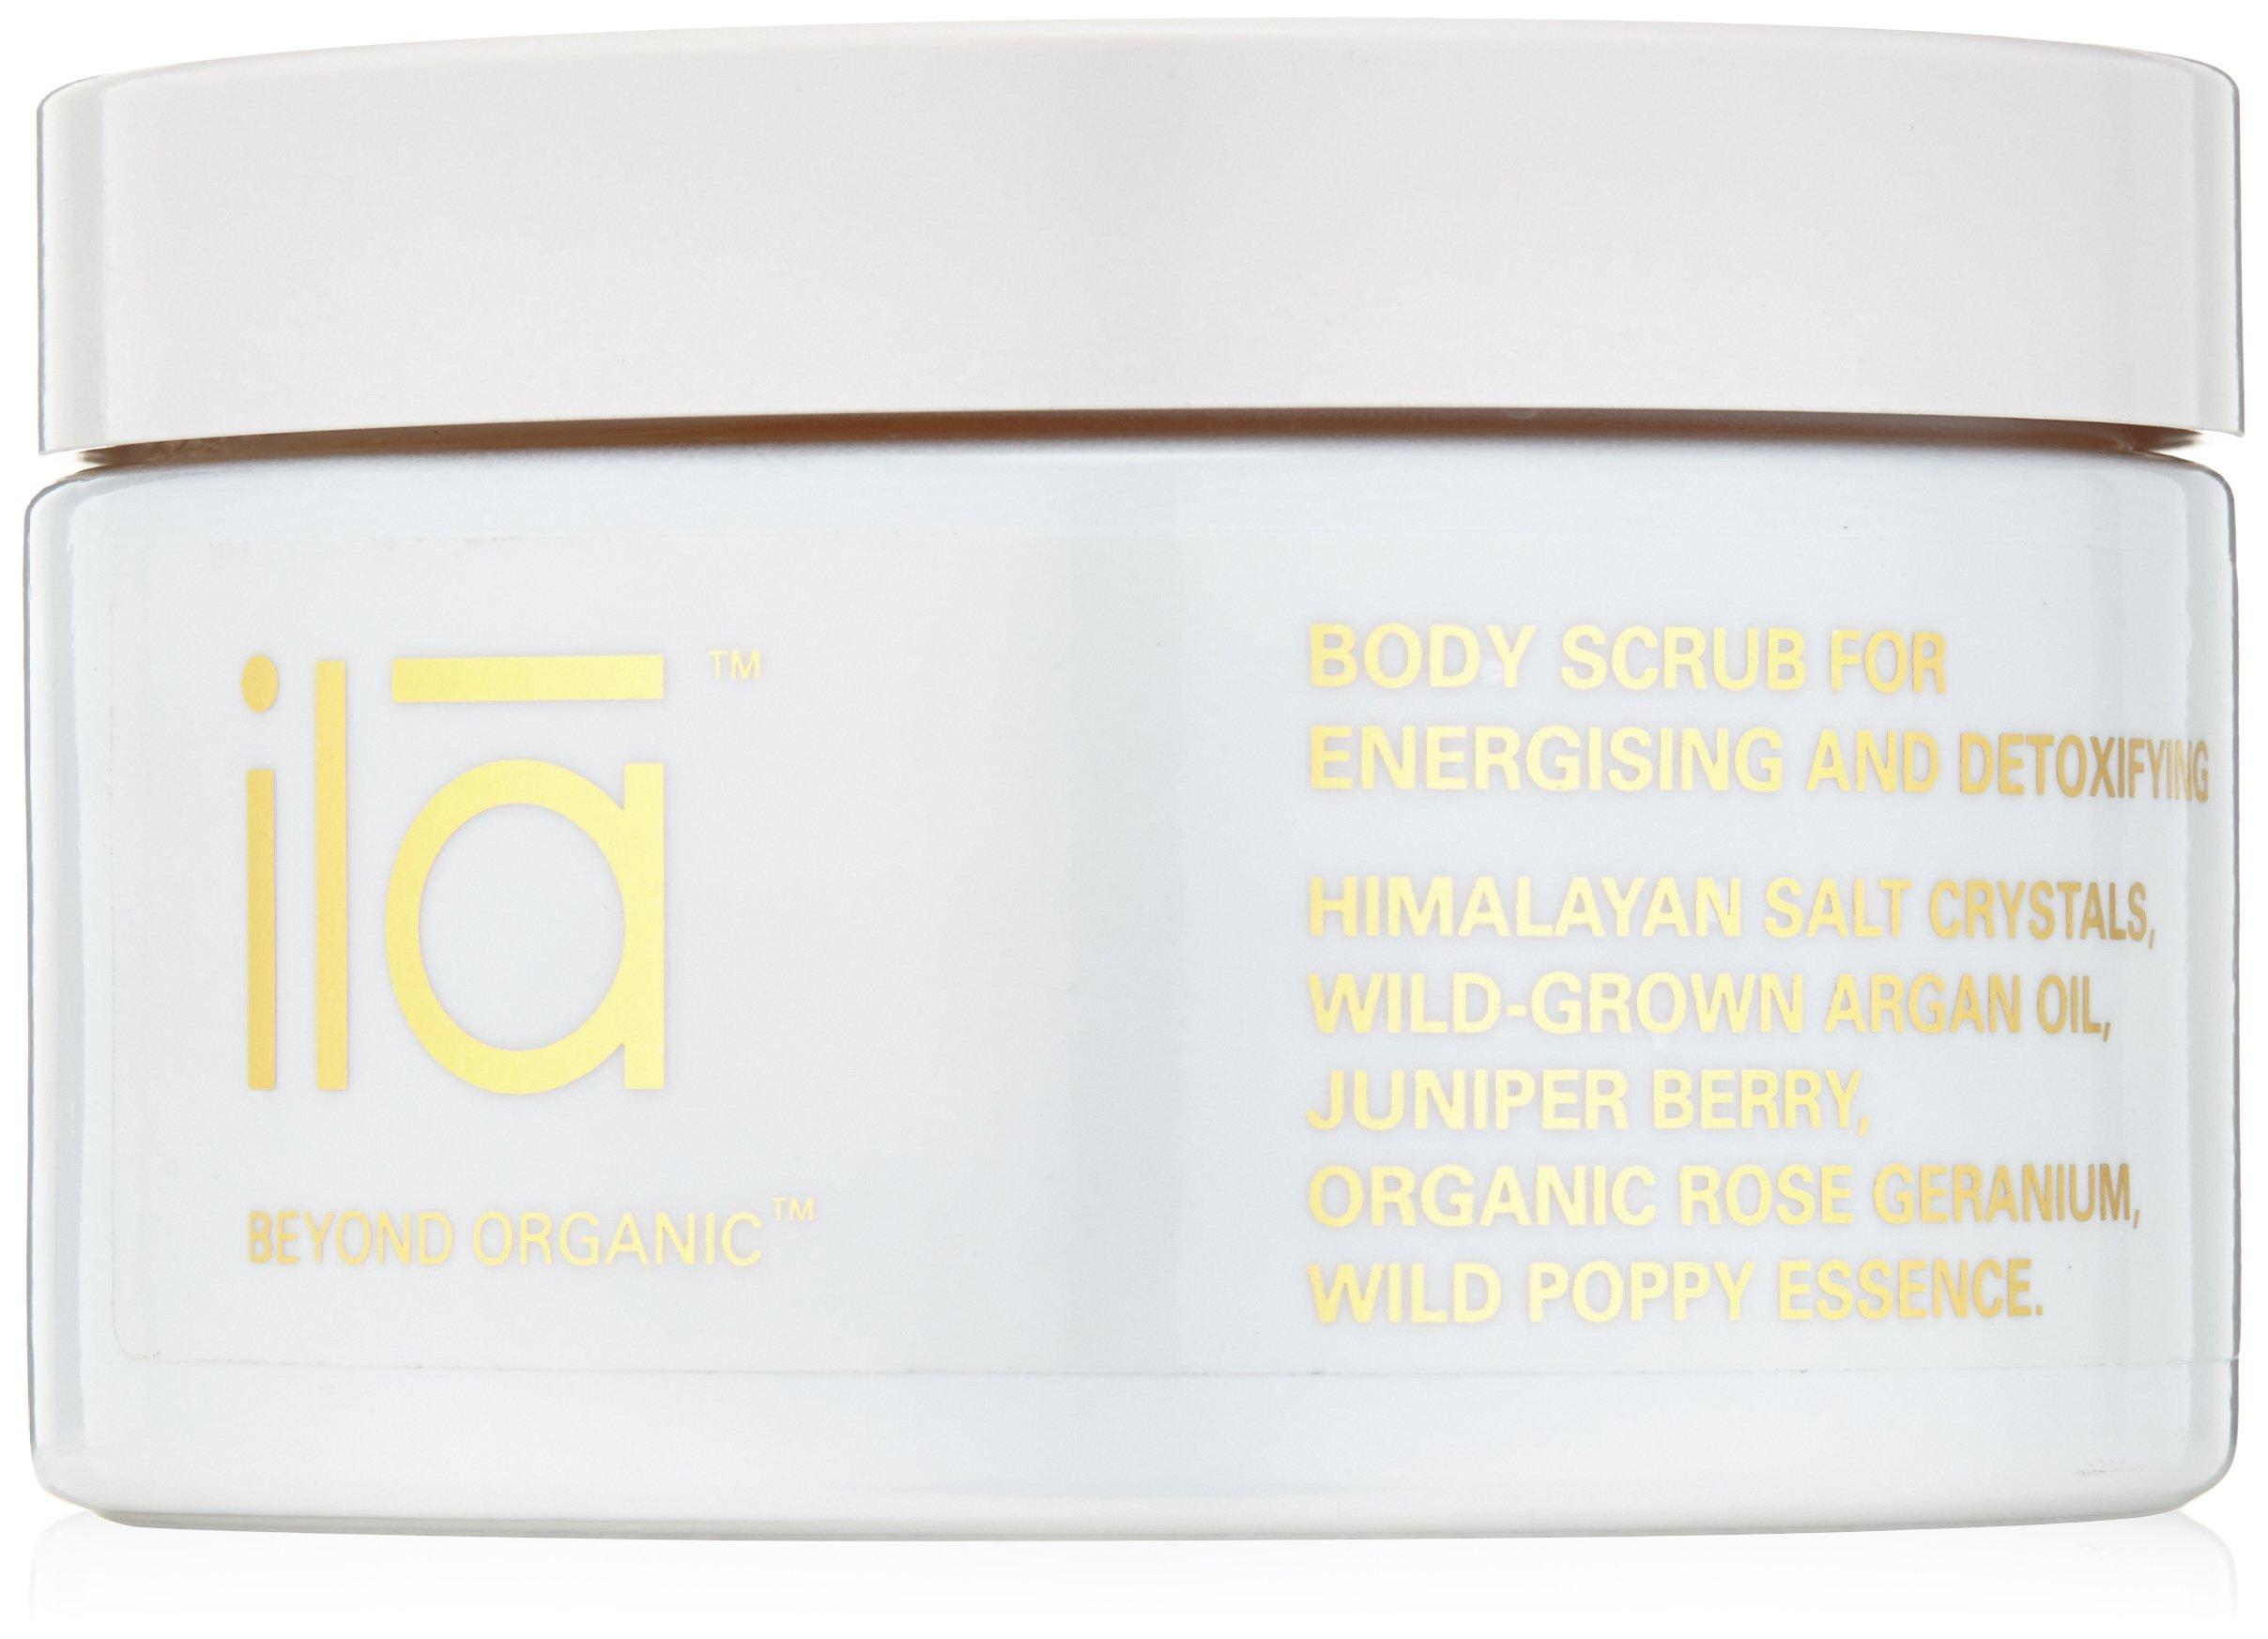 ila-Spa Body Scrub for Energizing and Detoxifying, 8.82 oz